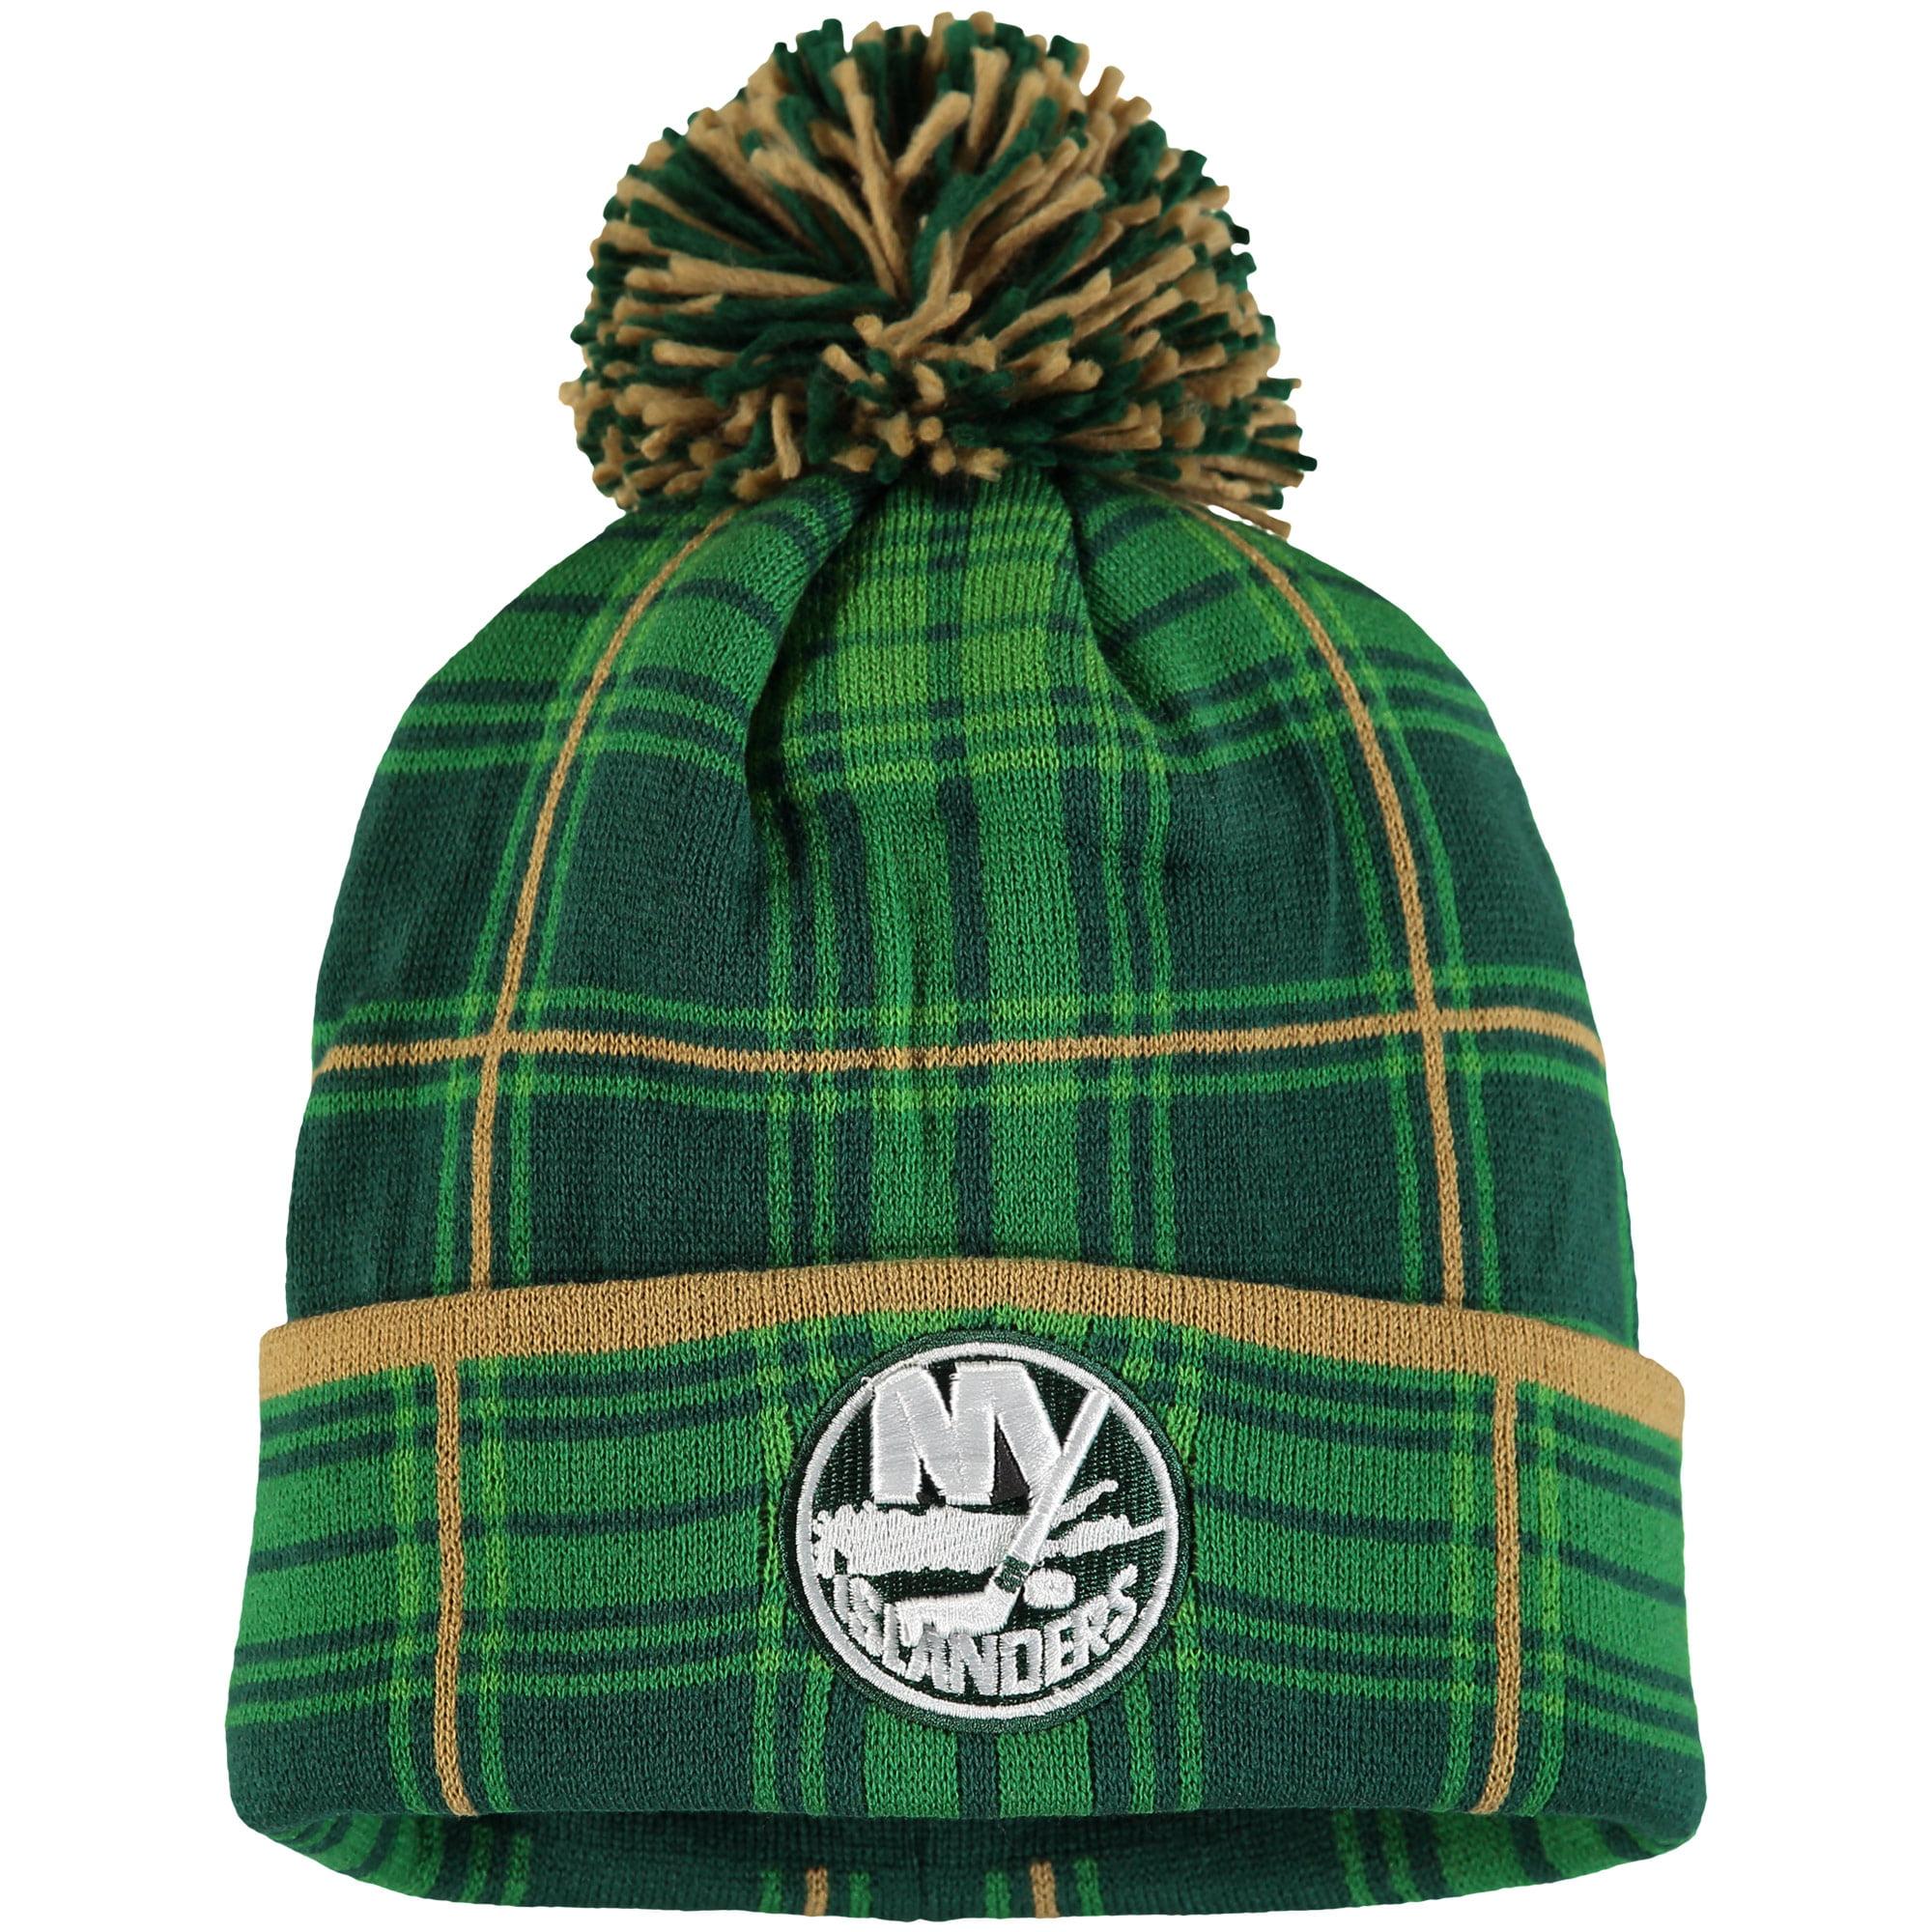 New York Islanders Reebok St. Patrick's Day Cuffed Knit Hat with Pom Green OSFA by REEBOK/SLD/ADIDAS INDY